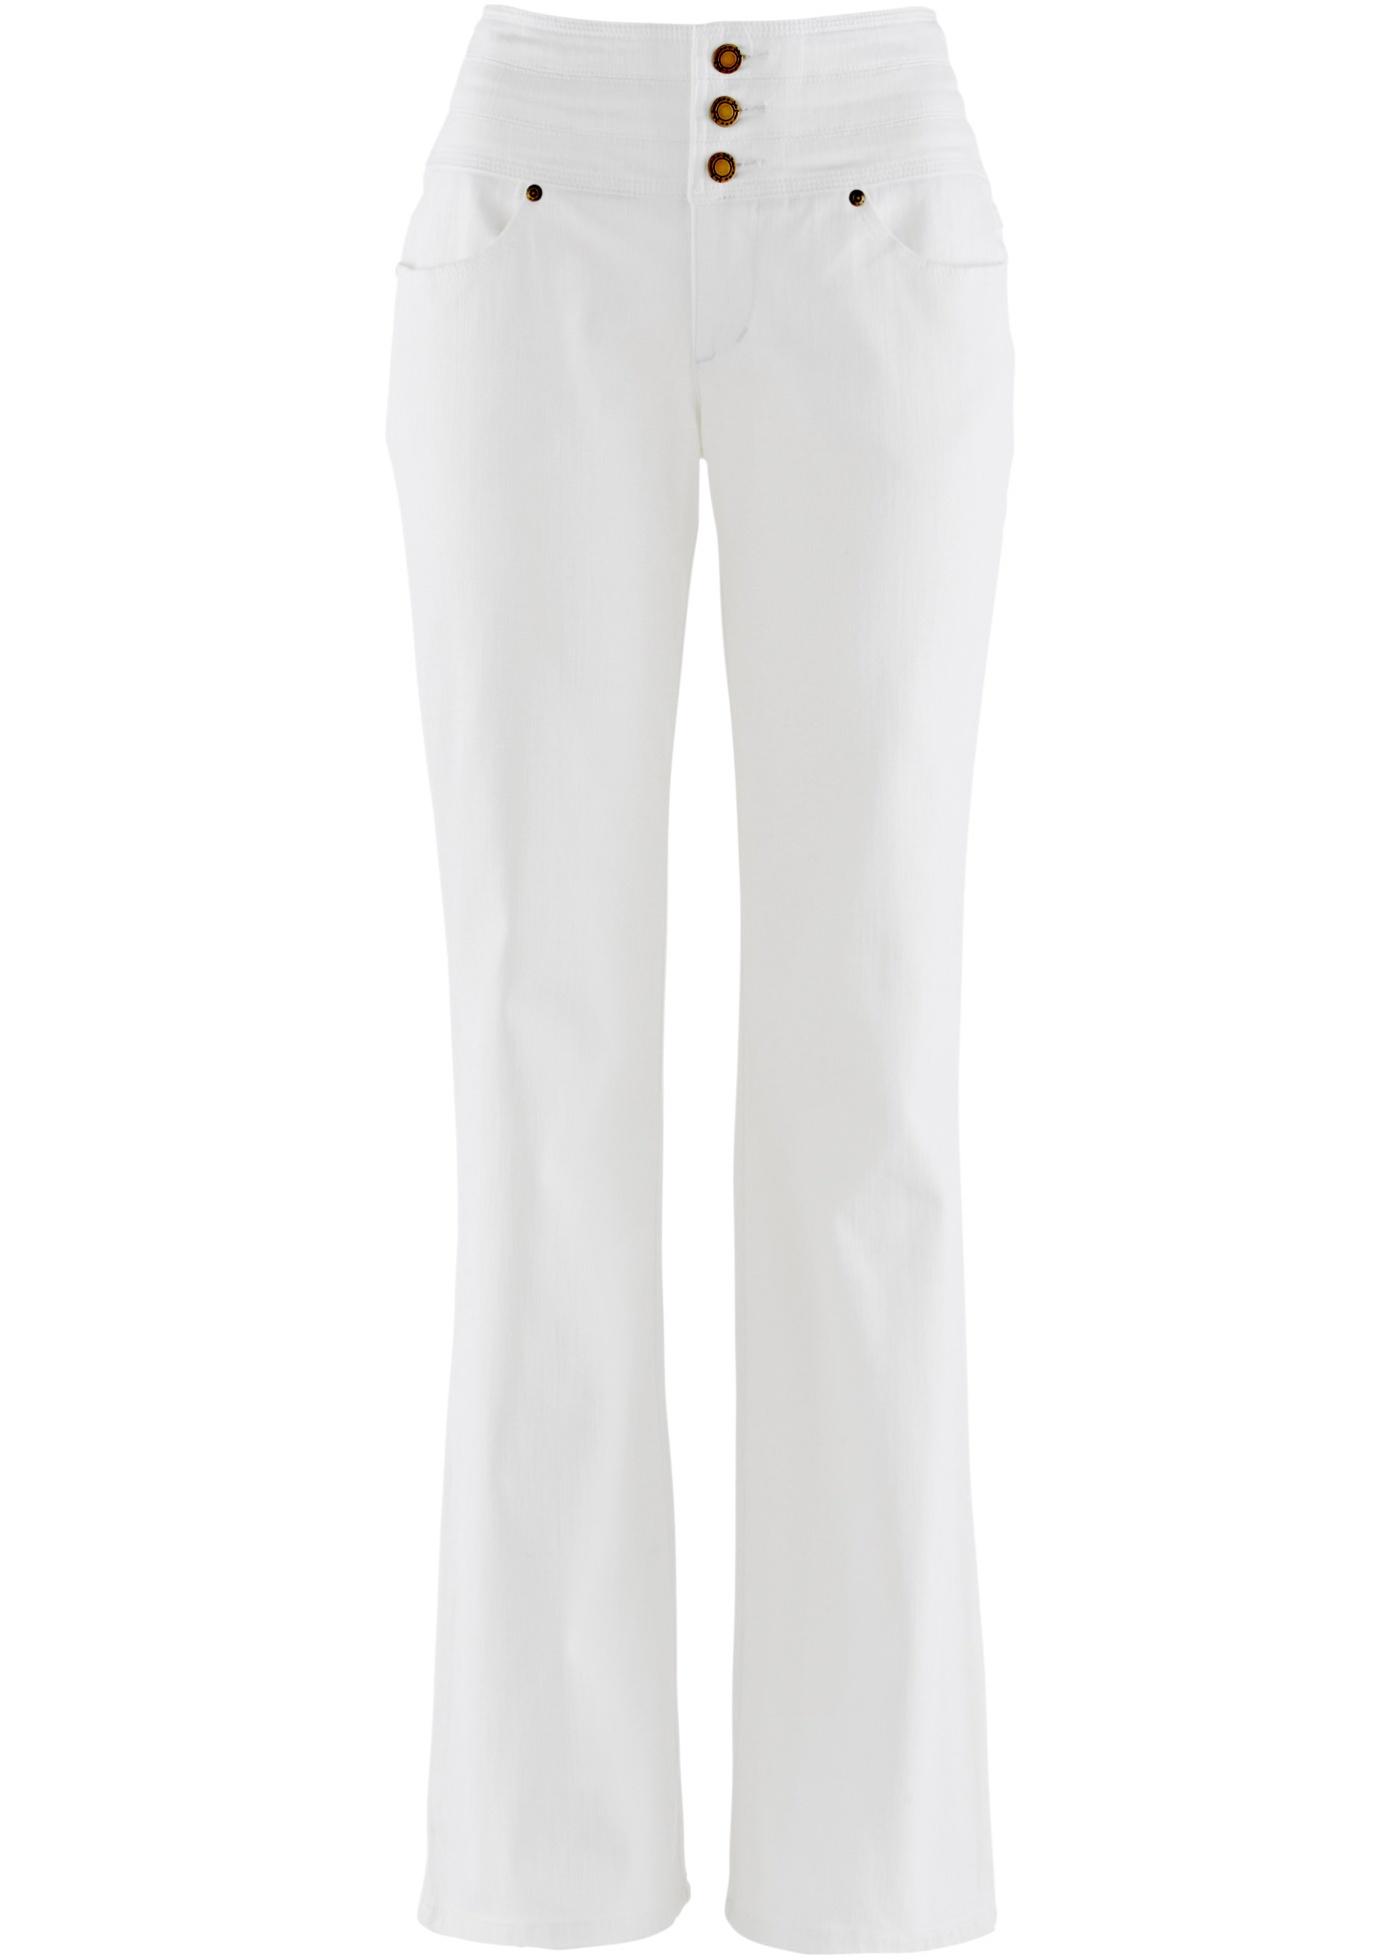 bootcut stretch jeans kurz gr 44 wei damenjeans hose flared leg pants neu ebay. Black Bedroom Furniture Sets. Home Design Ideas